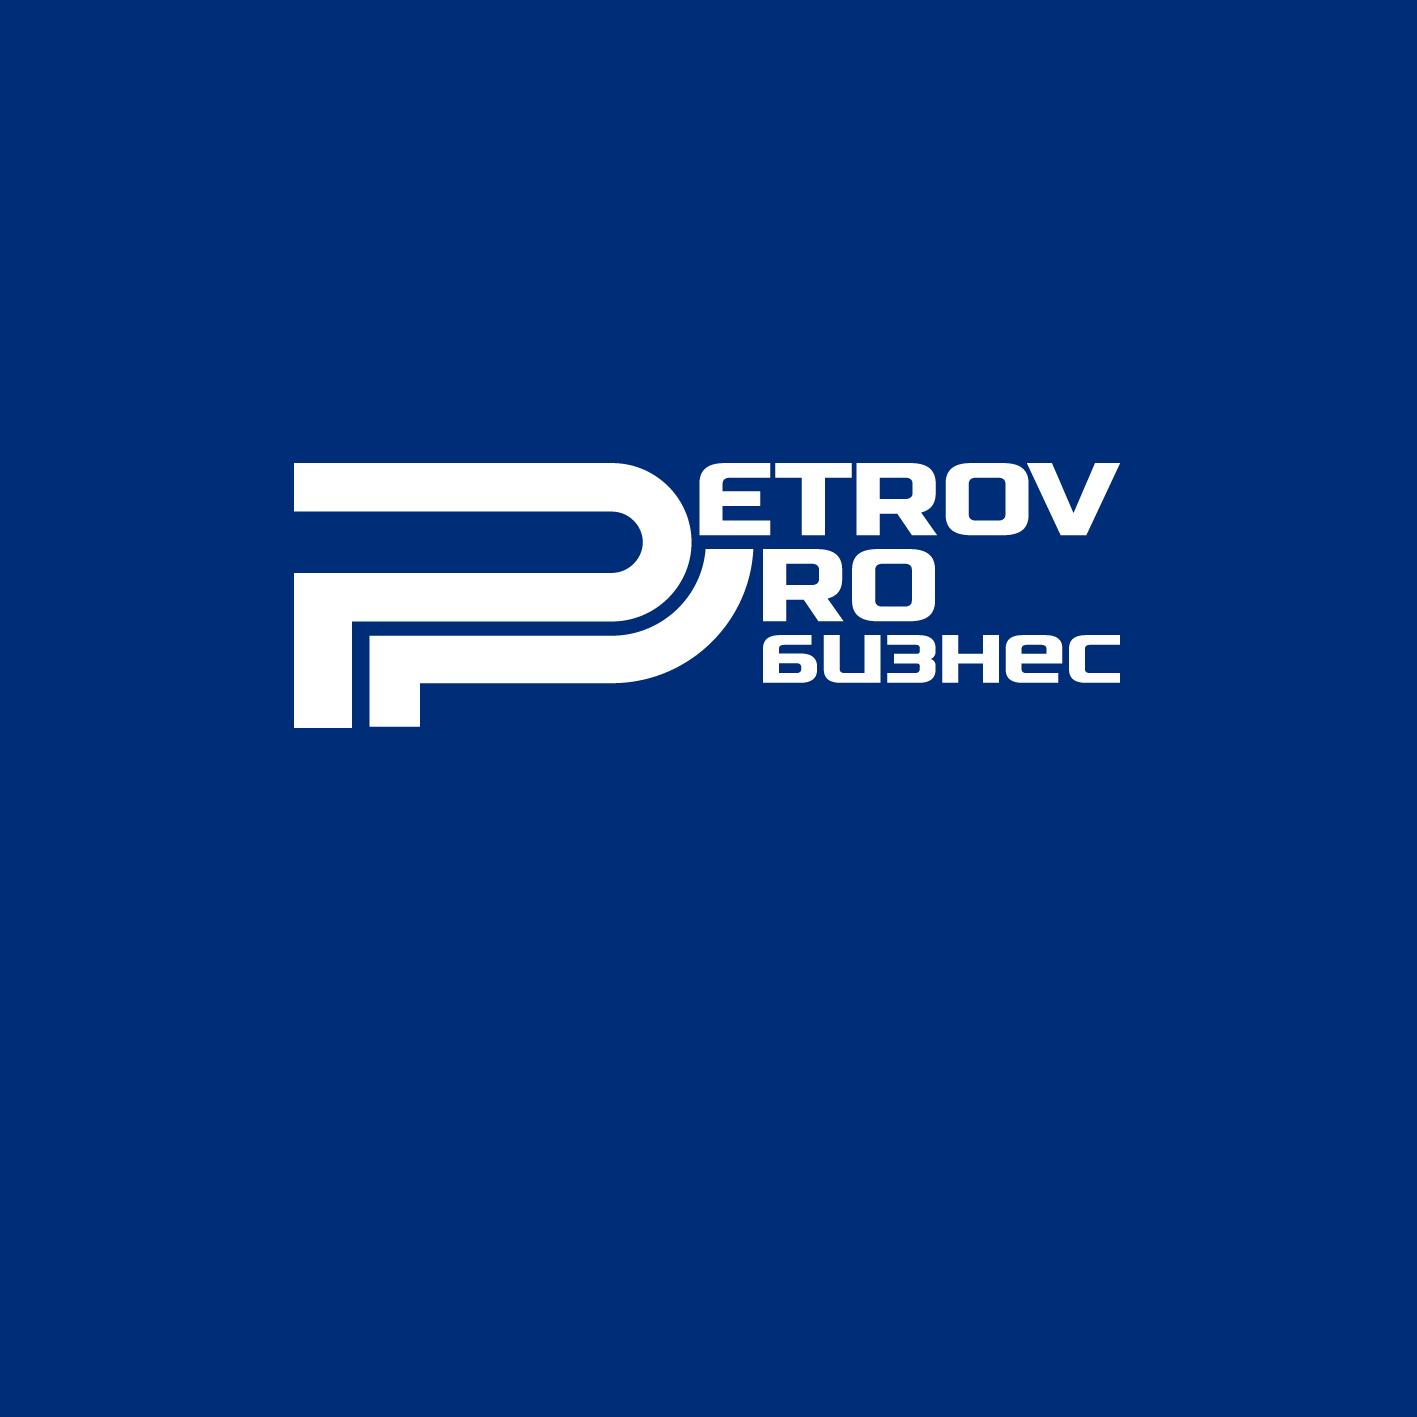 Создать логотип для YouTube канала  фото f_8325bfd0615bbb16.png